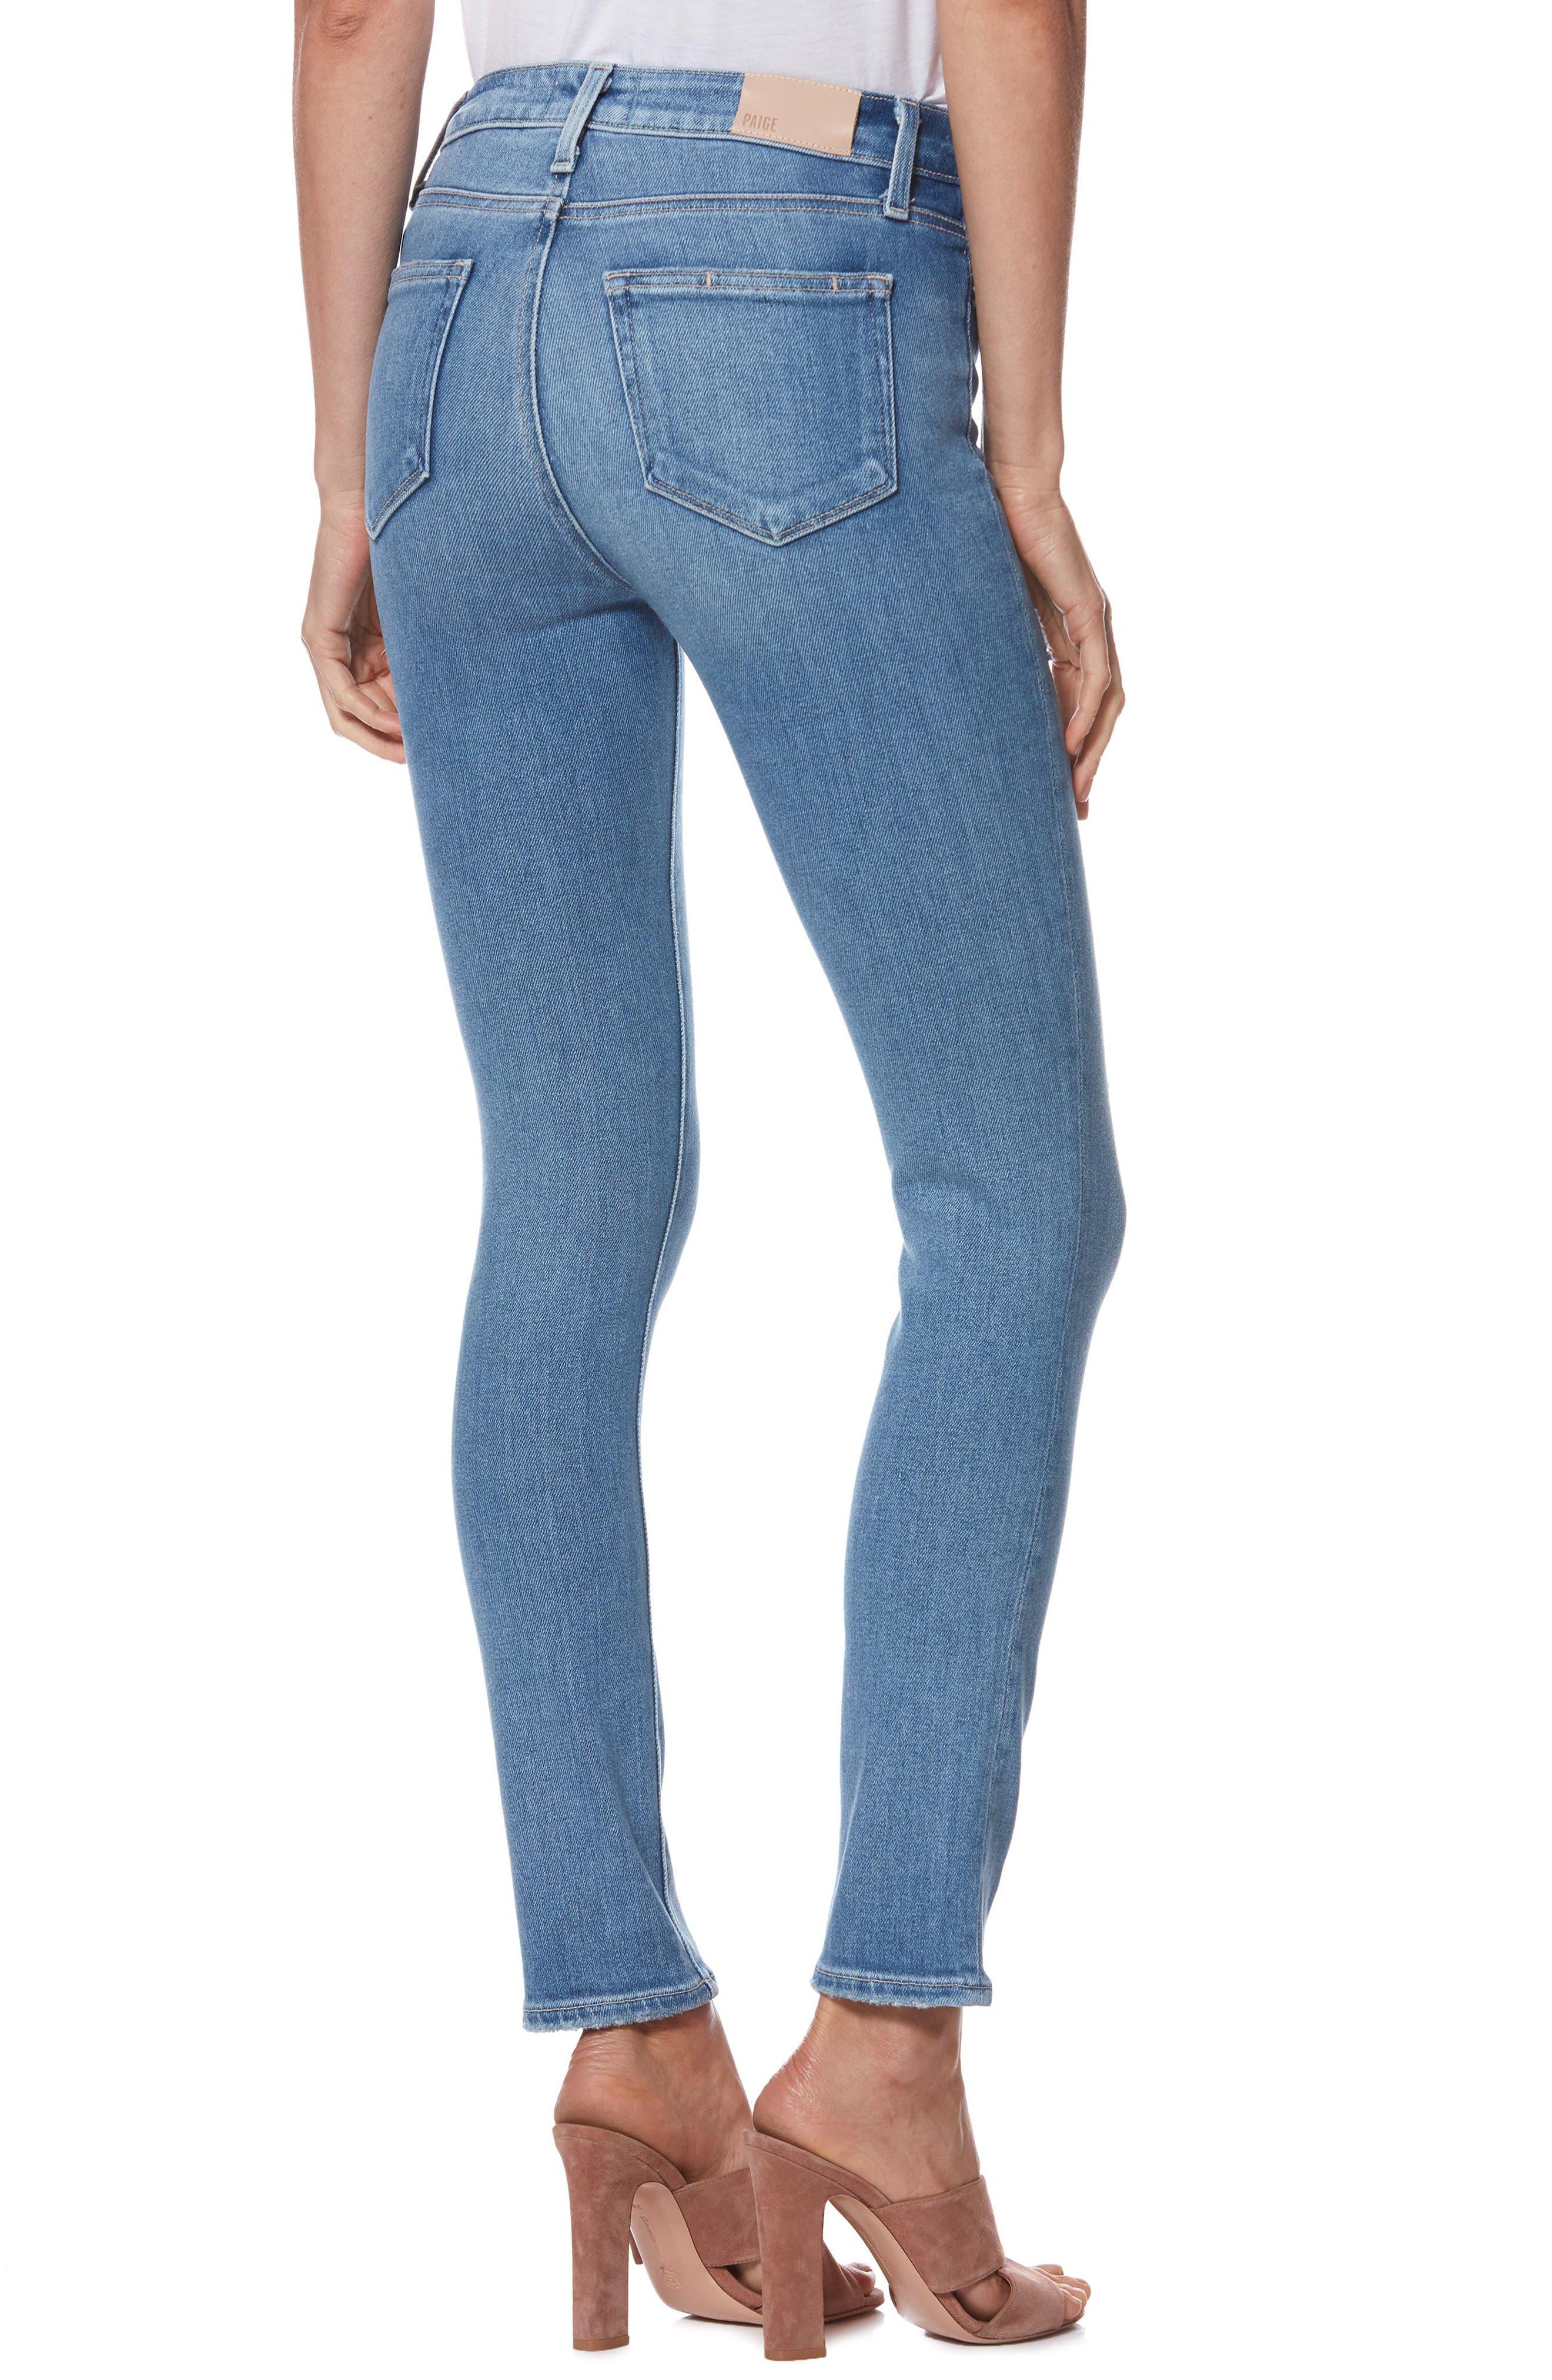 Hoxton High Waist Ankle Peg Jeans,                             Alternate thumbnail 2, color,                             KAYSON DISTRESSED